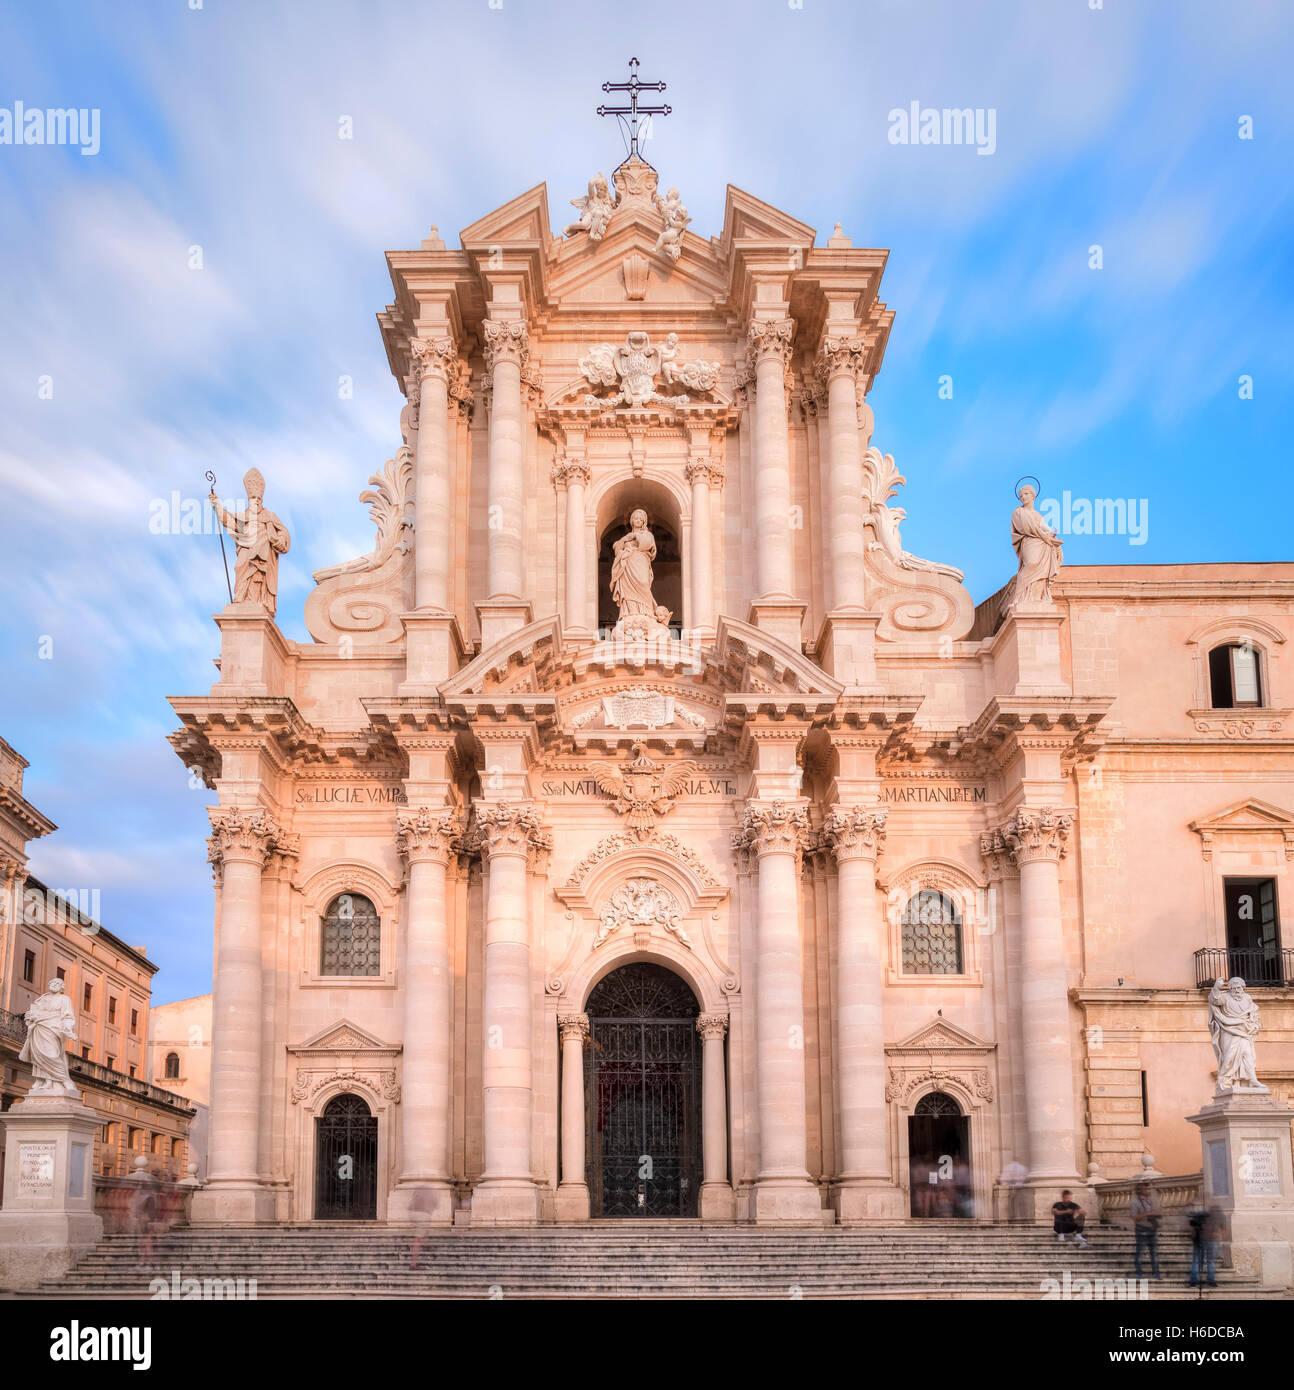 Piazza del Duomo, Ortigia, Siracusa, Sicily, Italy - Stock Image